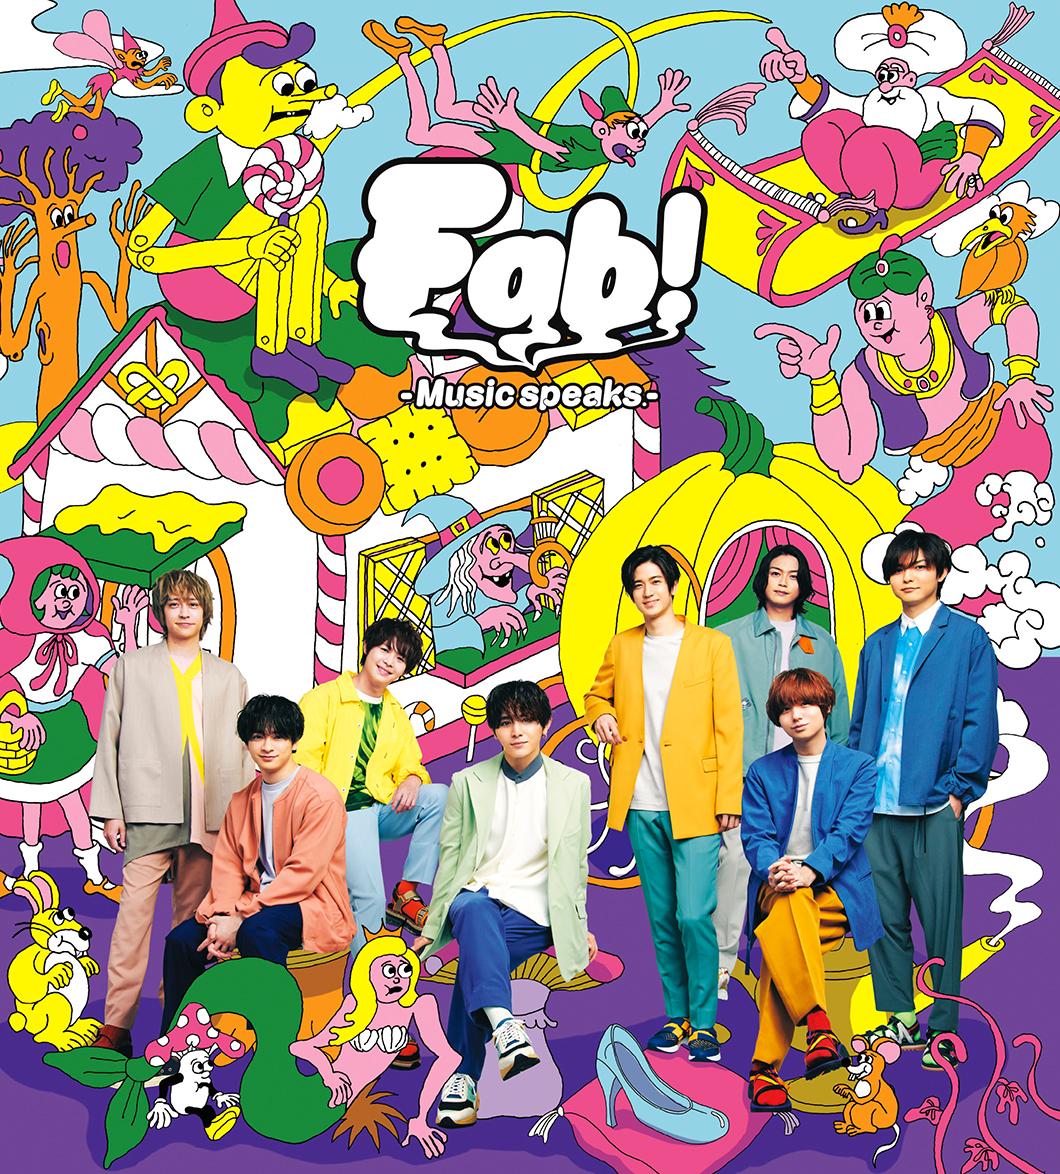 『Hey! Say! JUMP - Fab-ism』収録の『Fab! -Music speaks.-』ジャケット